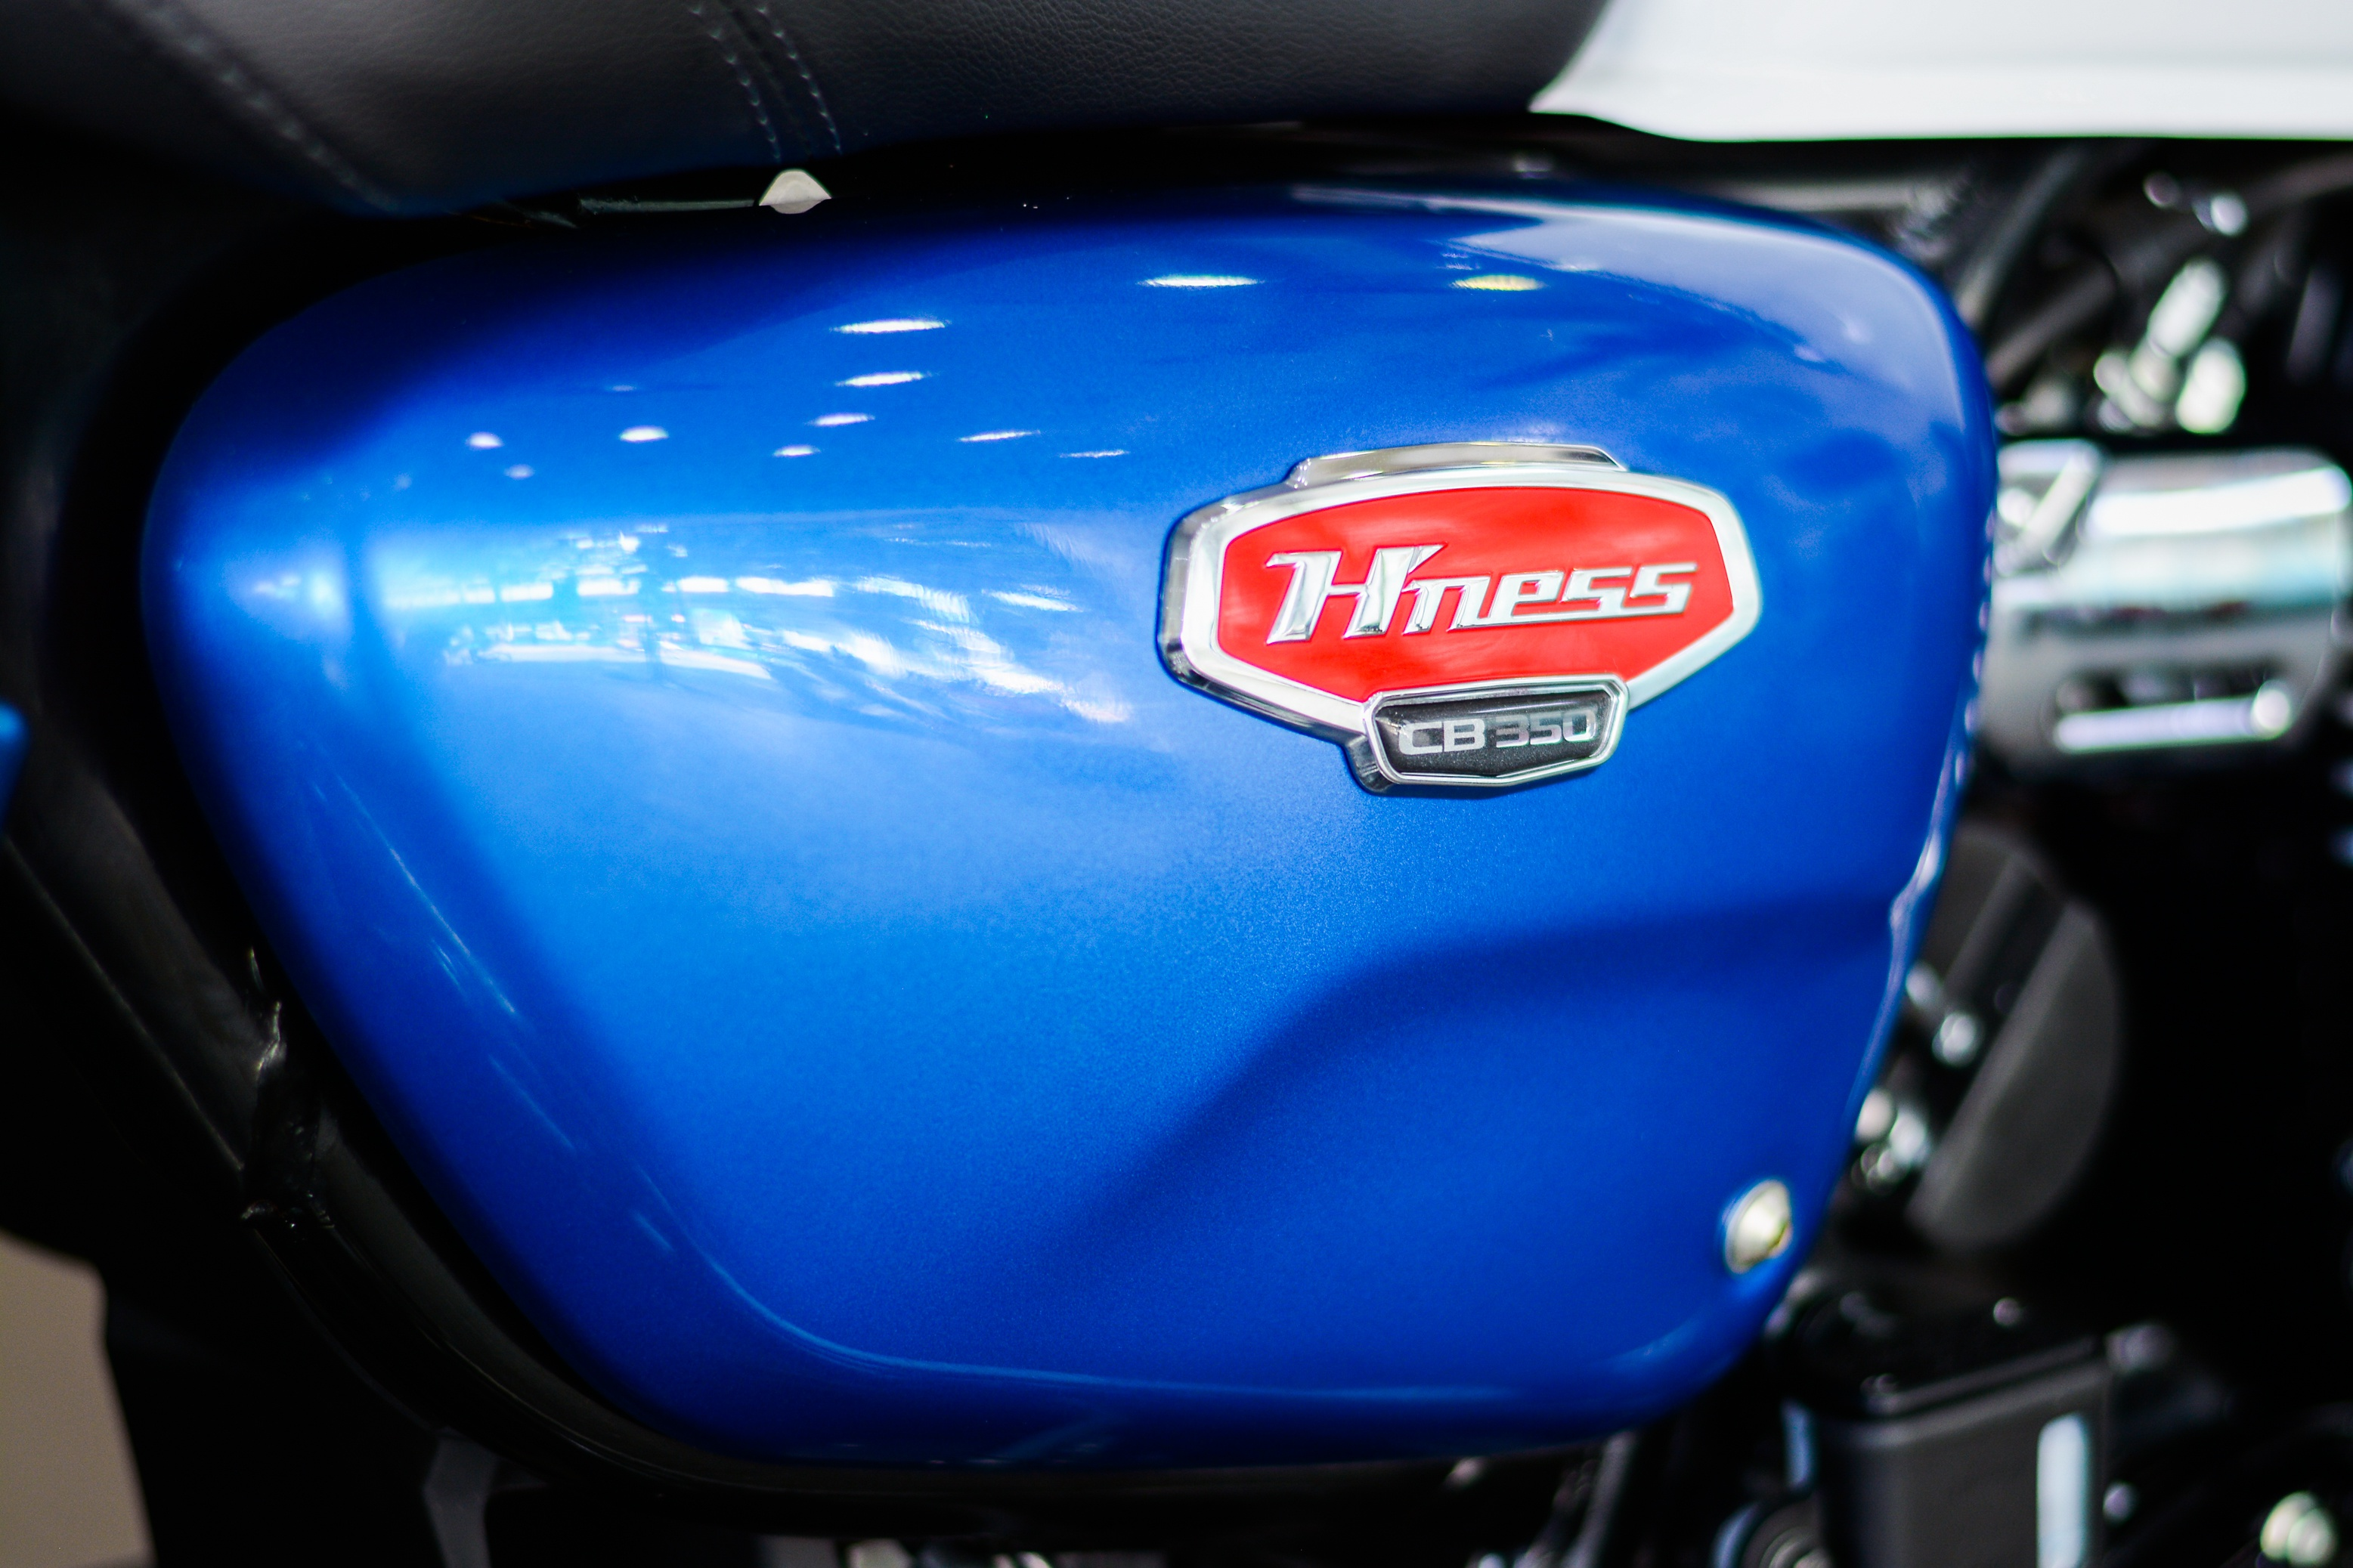 Honda H'ness CB350 DLX Pro xuat hien tai Viet Nam anh 14